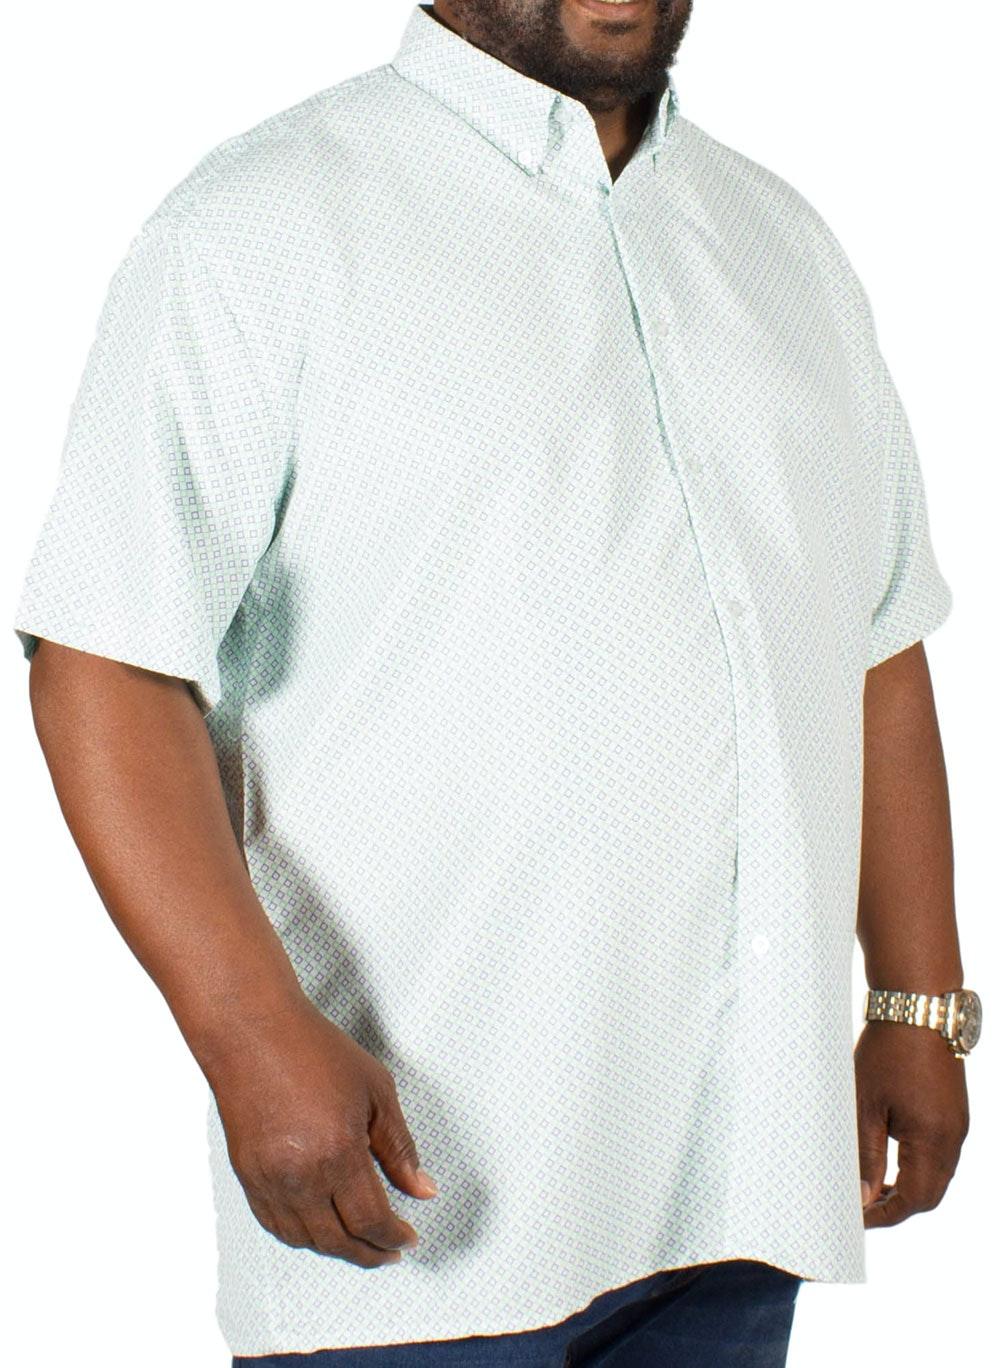 Fitzgerald Marcus Diamond Print Shirt Green/Blue